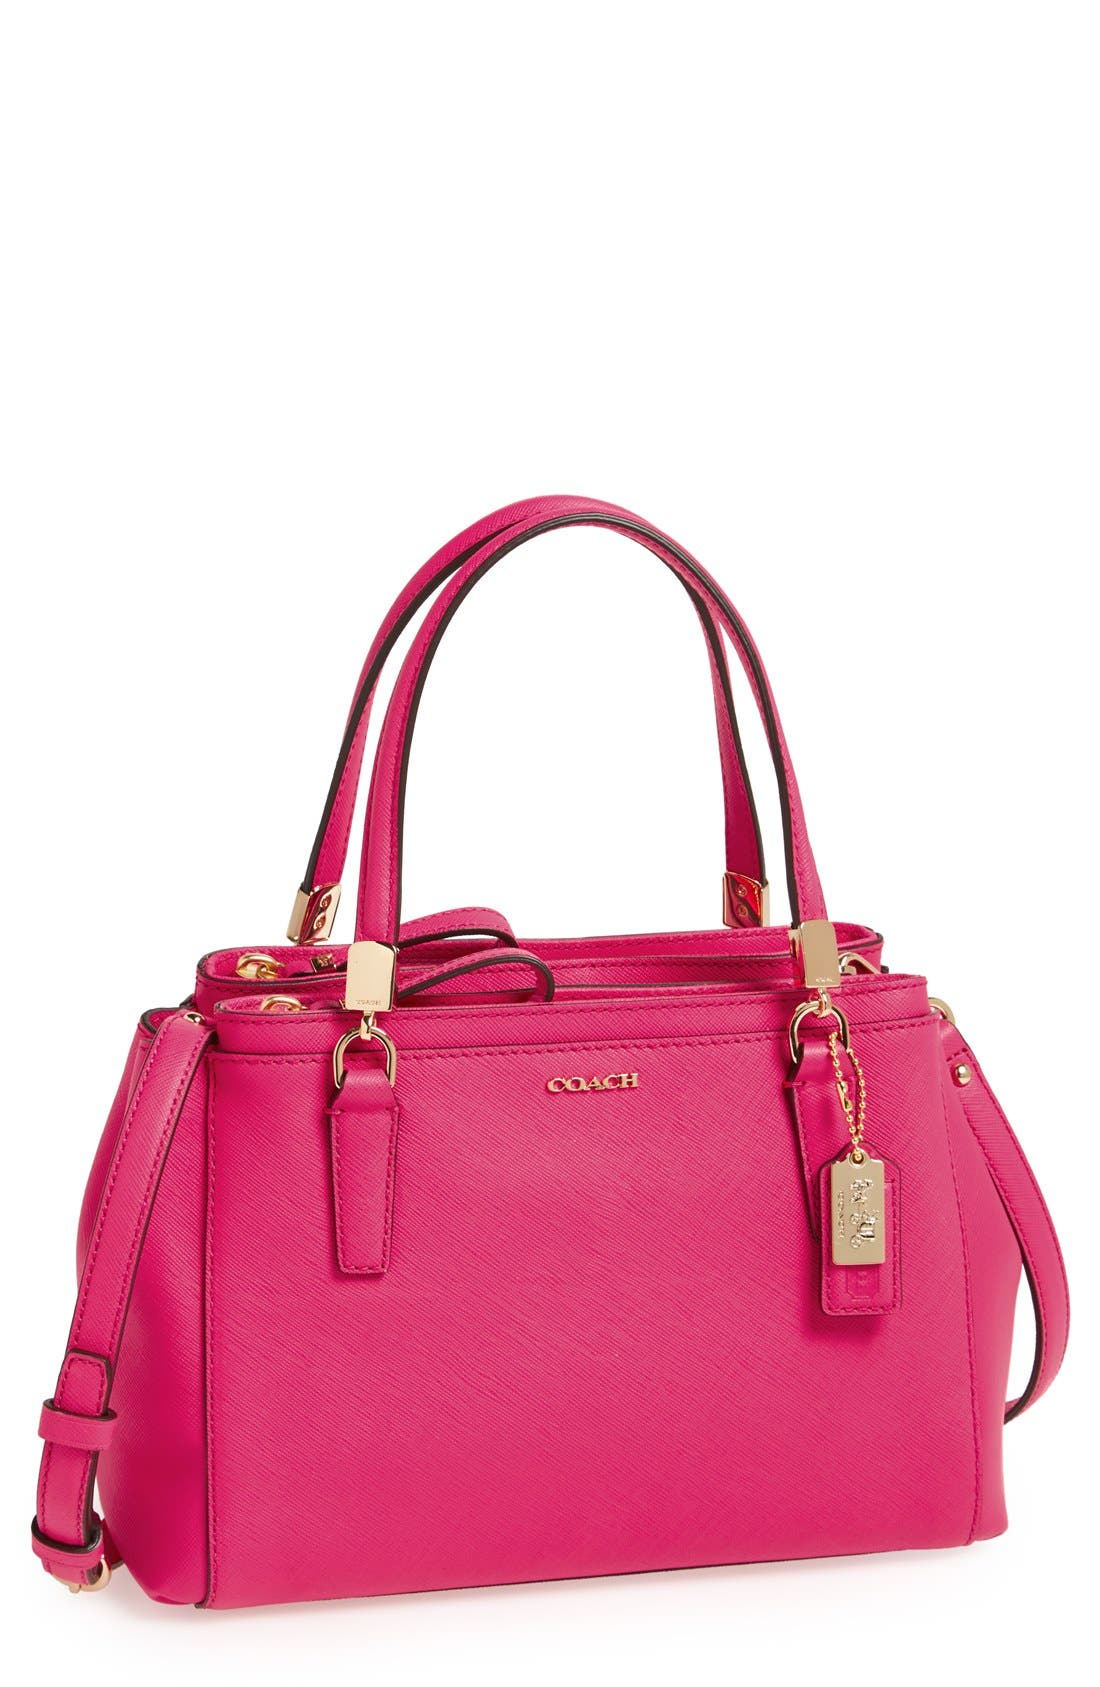 Alternate Image 1 Selected - COACH 'Madison - Mini Christie' Saffiano Leather Satchel